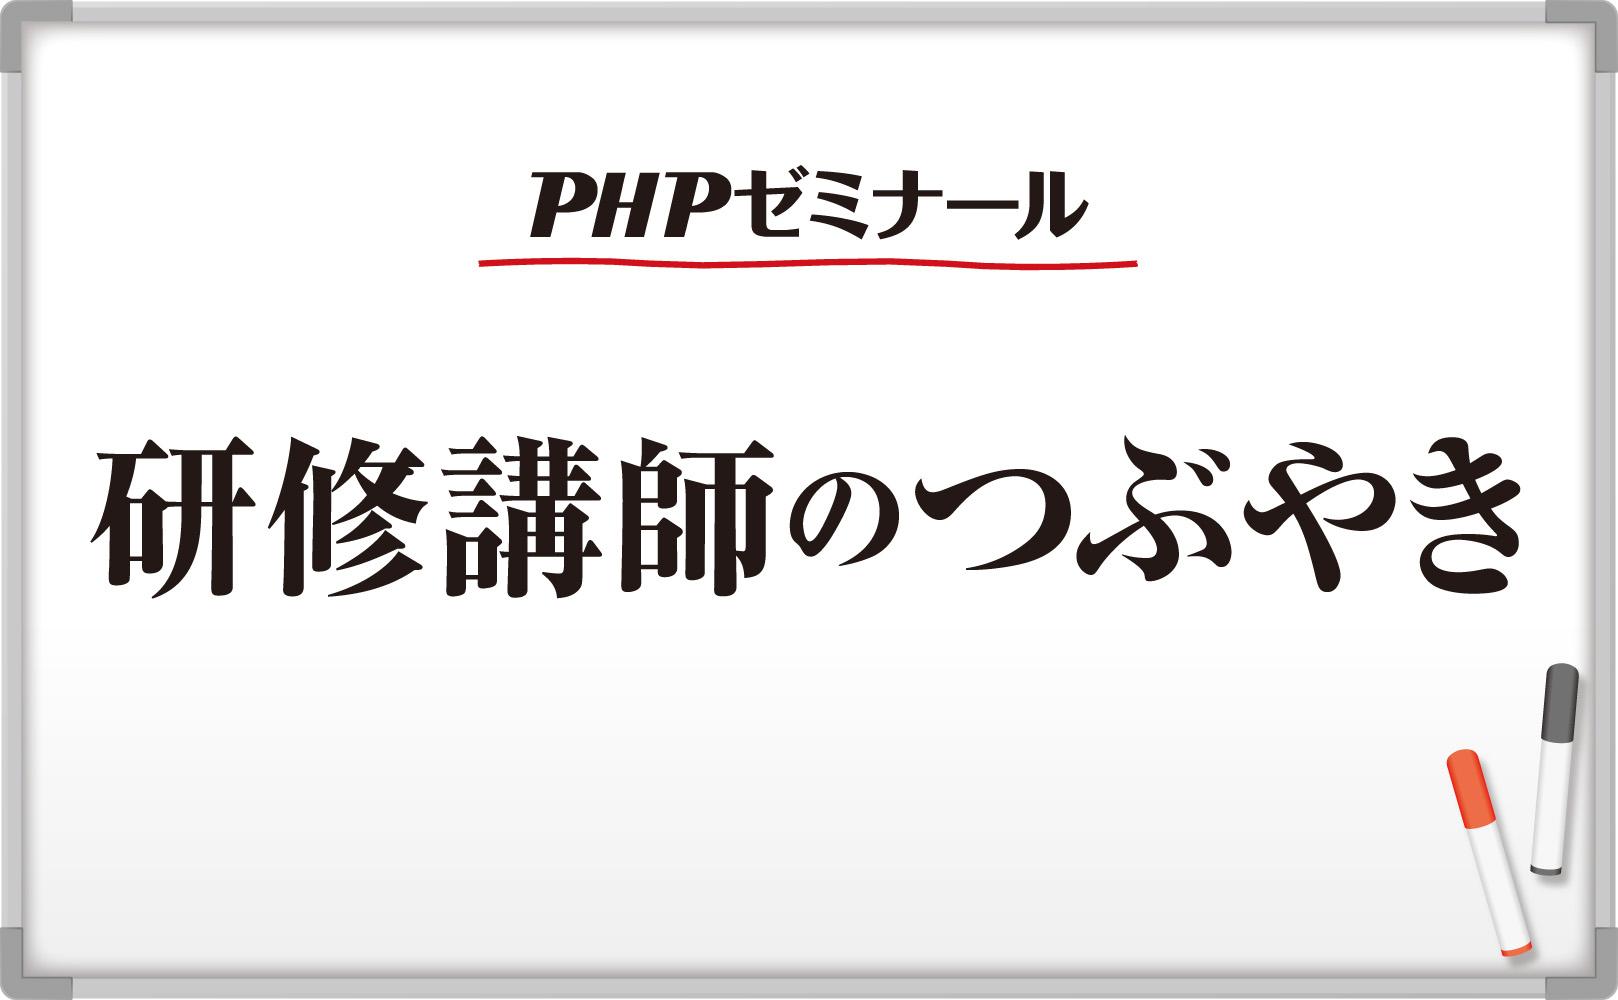 DJポリスに学ぶ伝え方【コラム】~國弘隆子